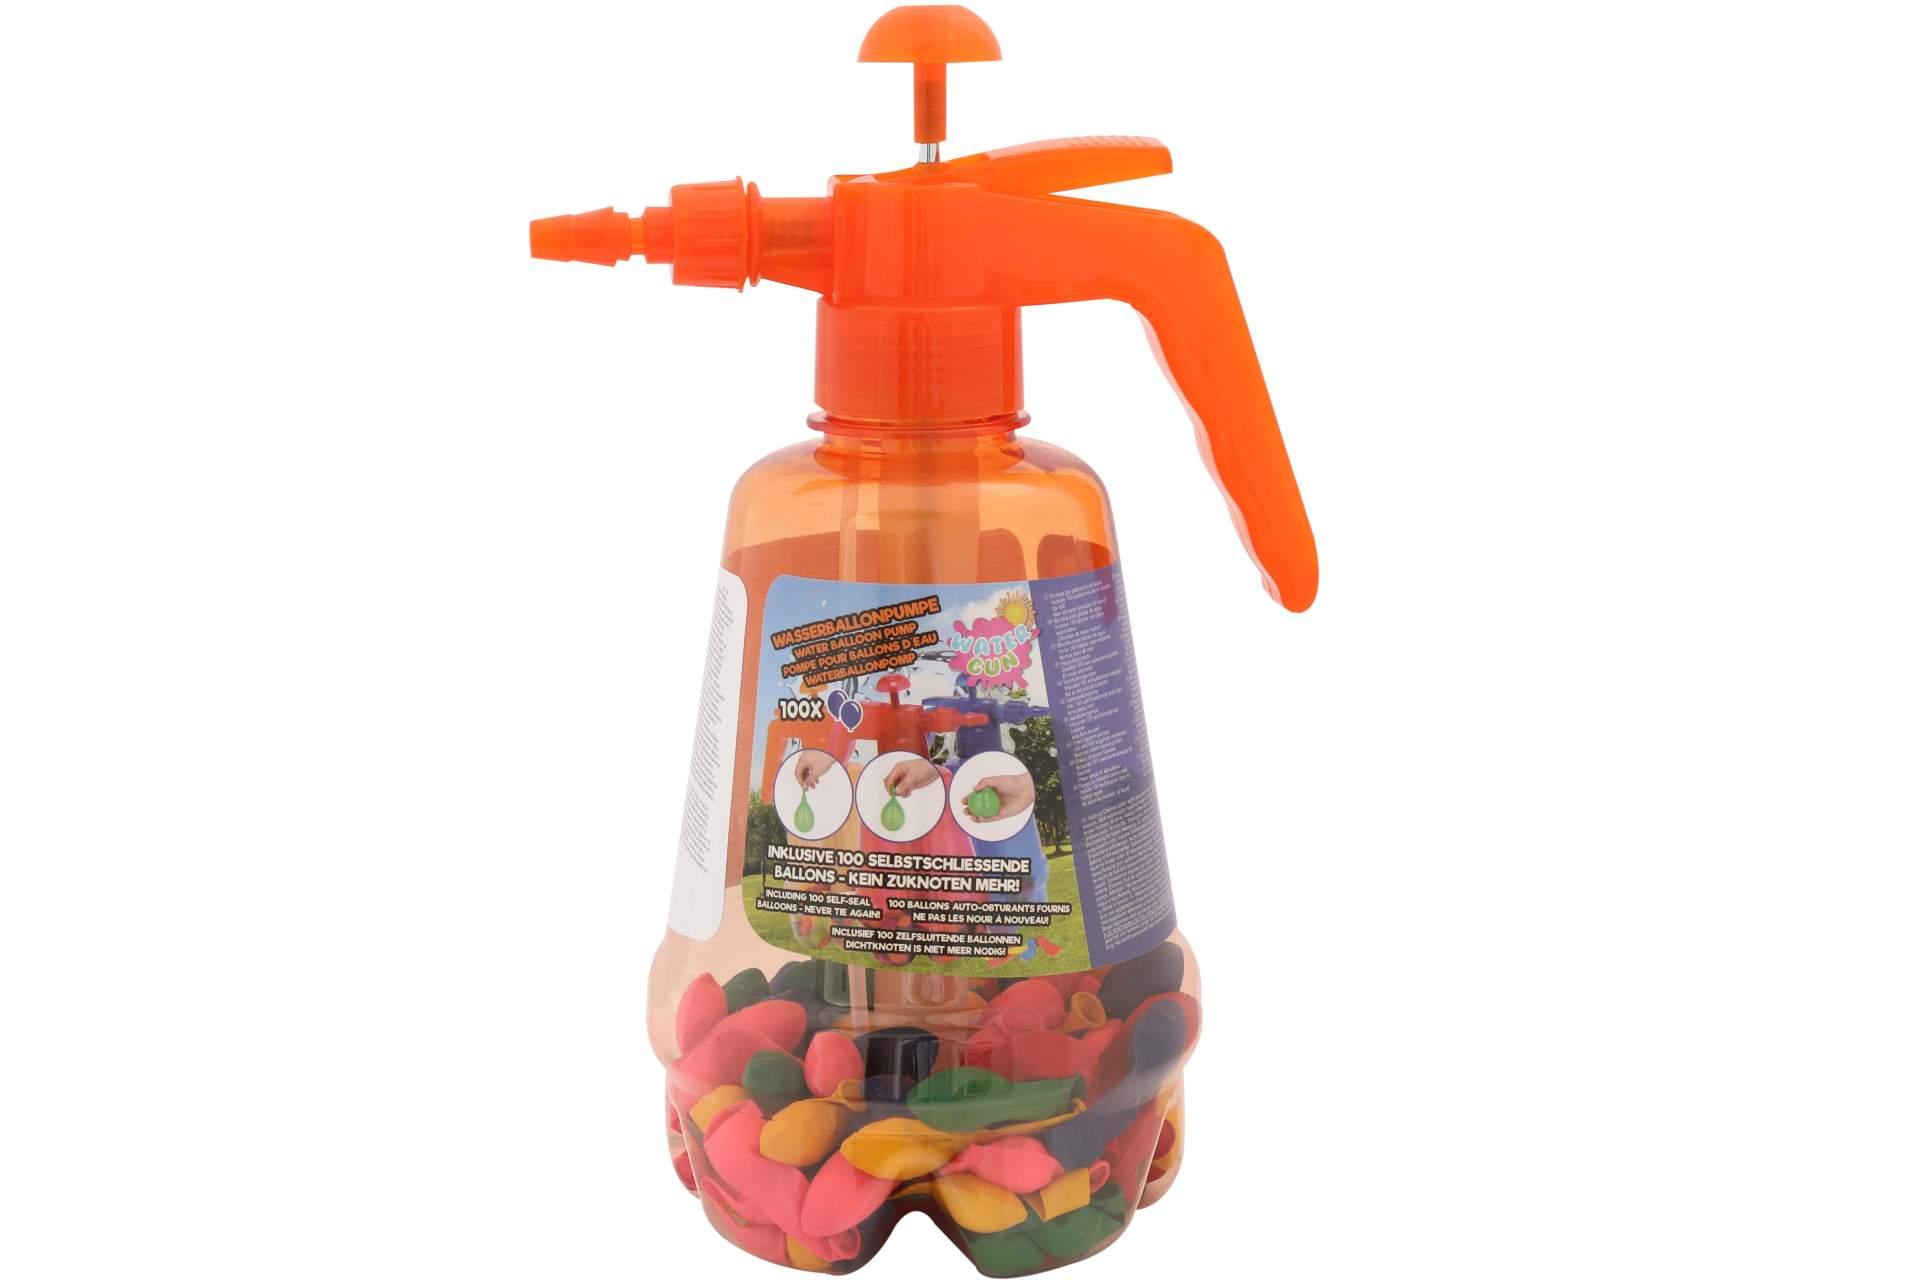 wasserballons 100 stk selbstschlie end ballonpumpe orange spielzeug f r drau en. Black Bedroom Furniture Sets. Home Design Ideas